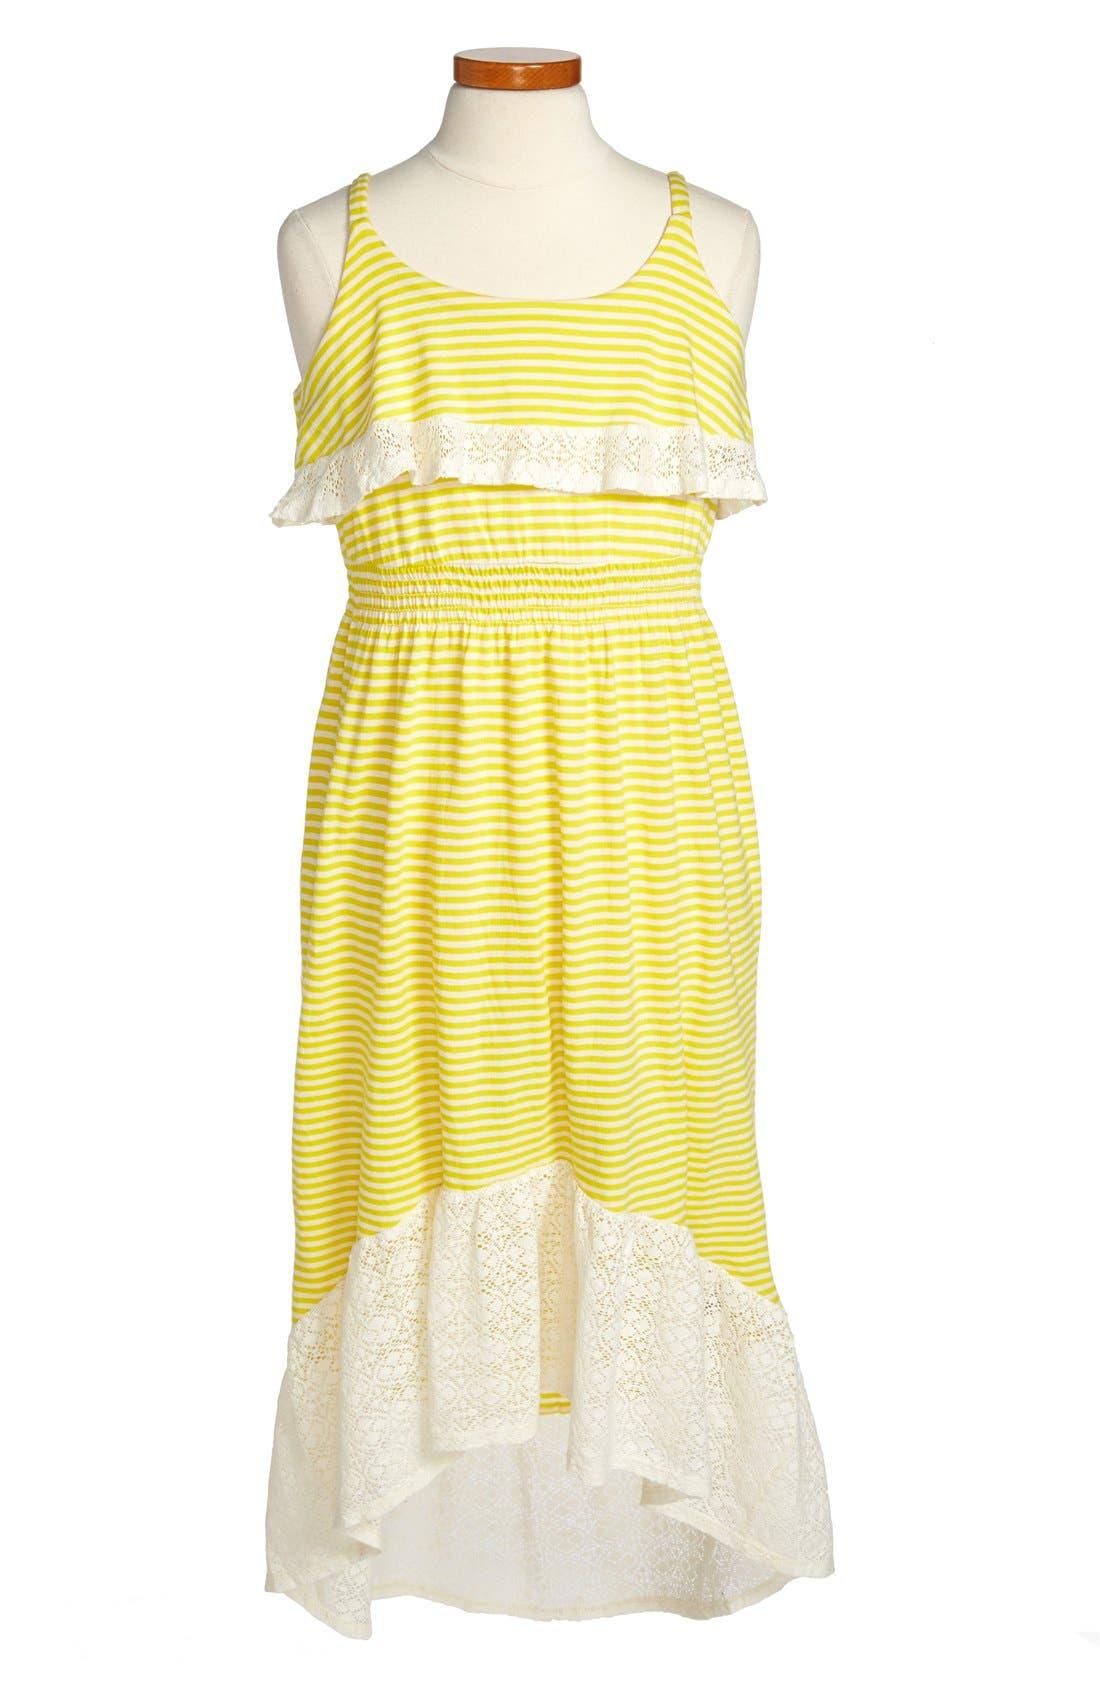 Main Image - Roxy 'Kittridge' Knit Dress (Big Girls)